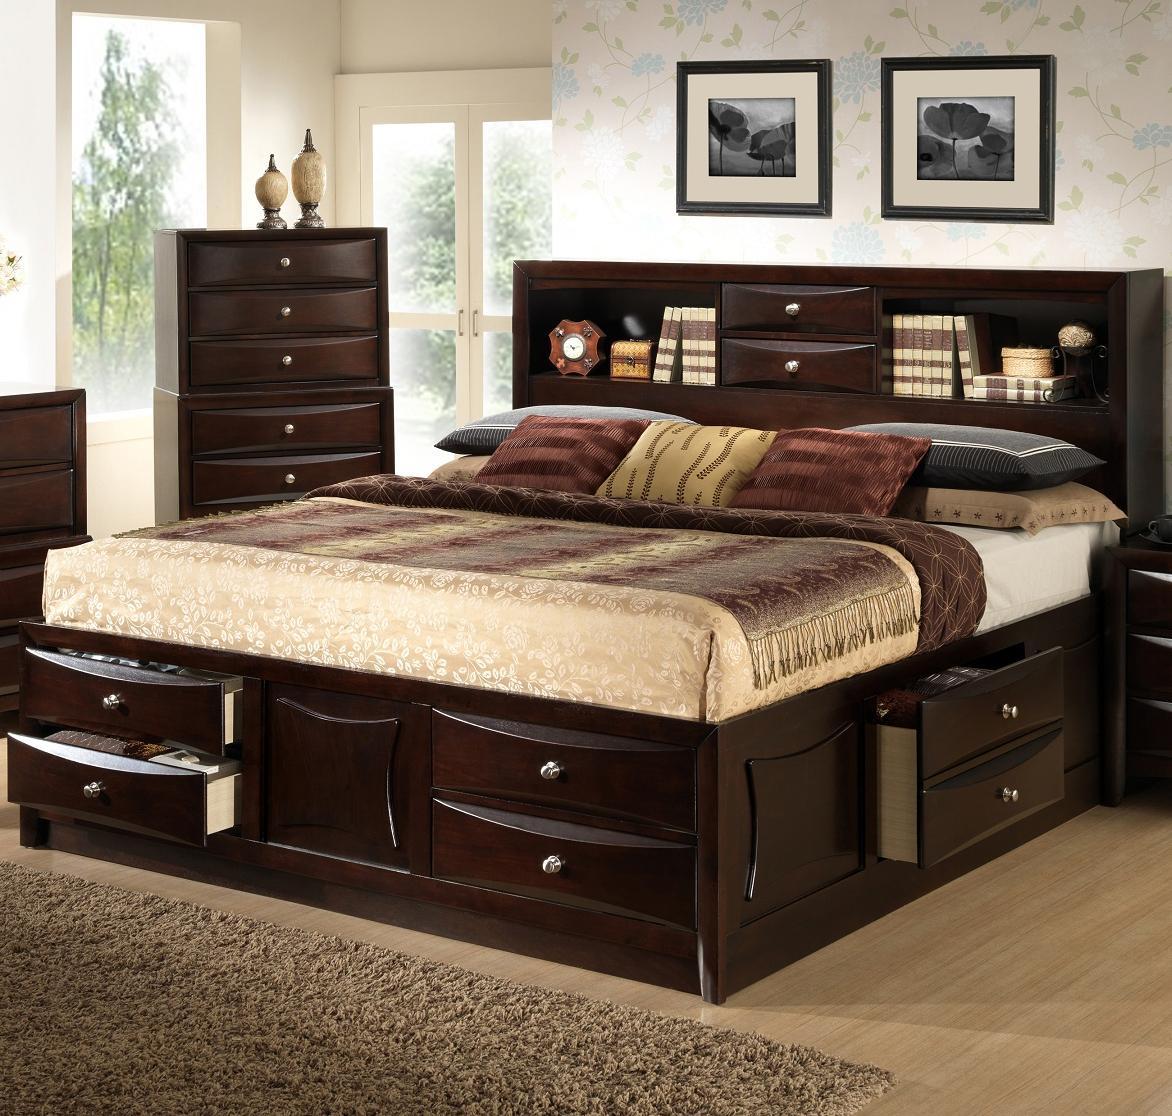 Lifestyle C0172 Queen Storage Bed w/ Bookcase Headboard & Lifestyle C0172 Queen Storage Bed w/ Bookcase Headboard | L Fish ...